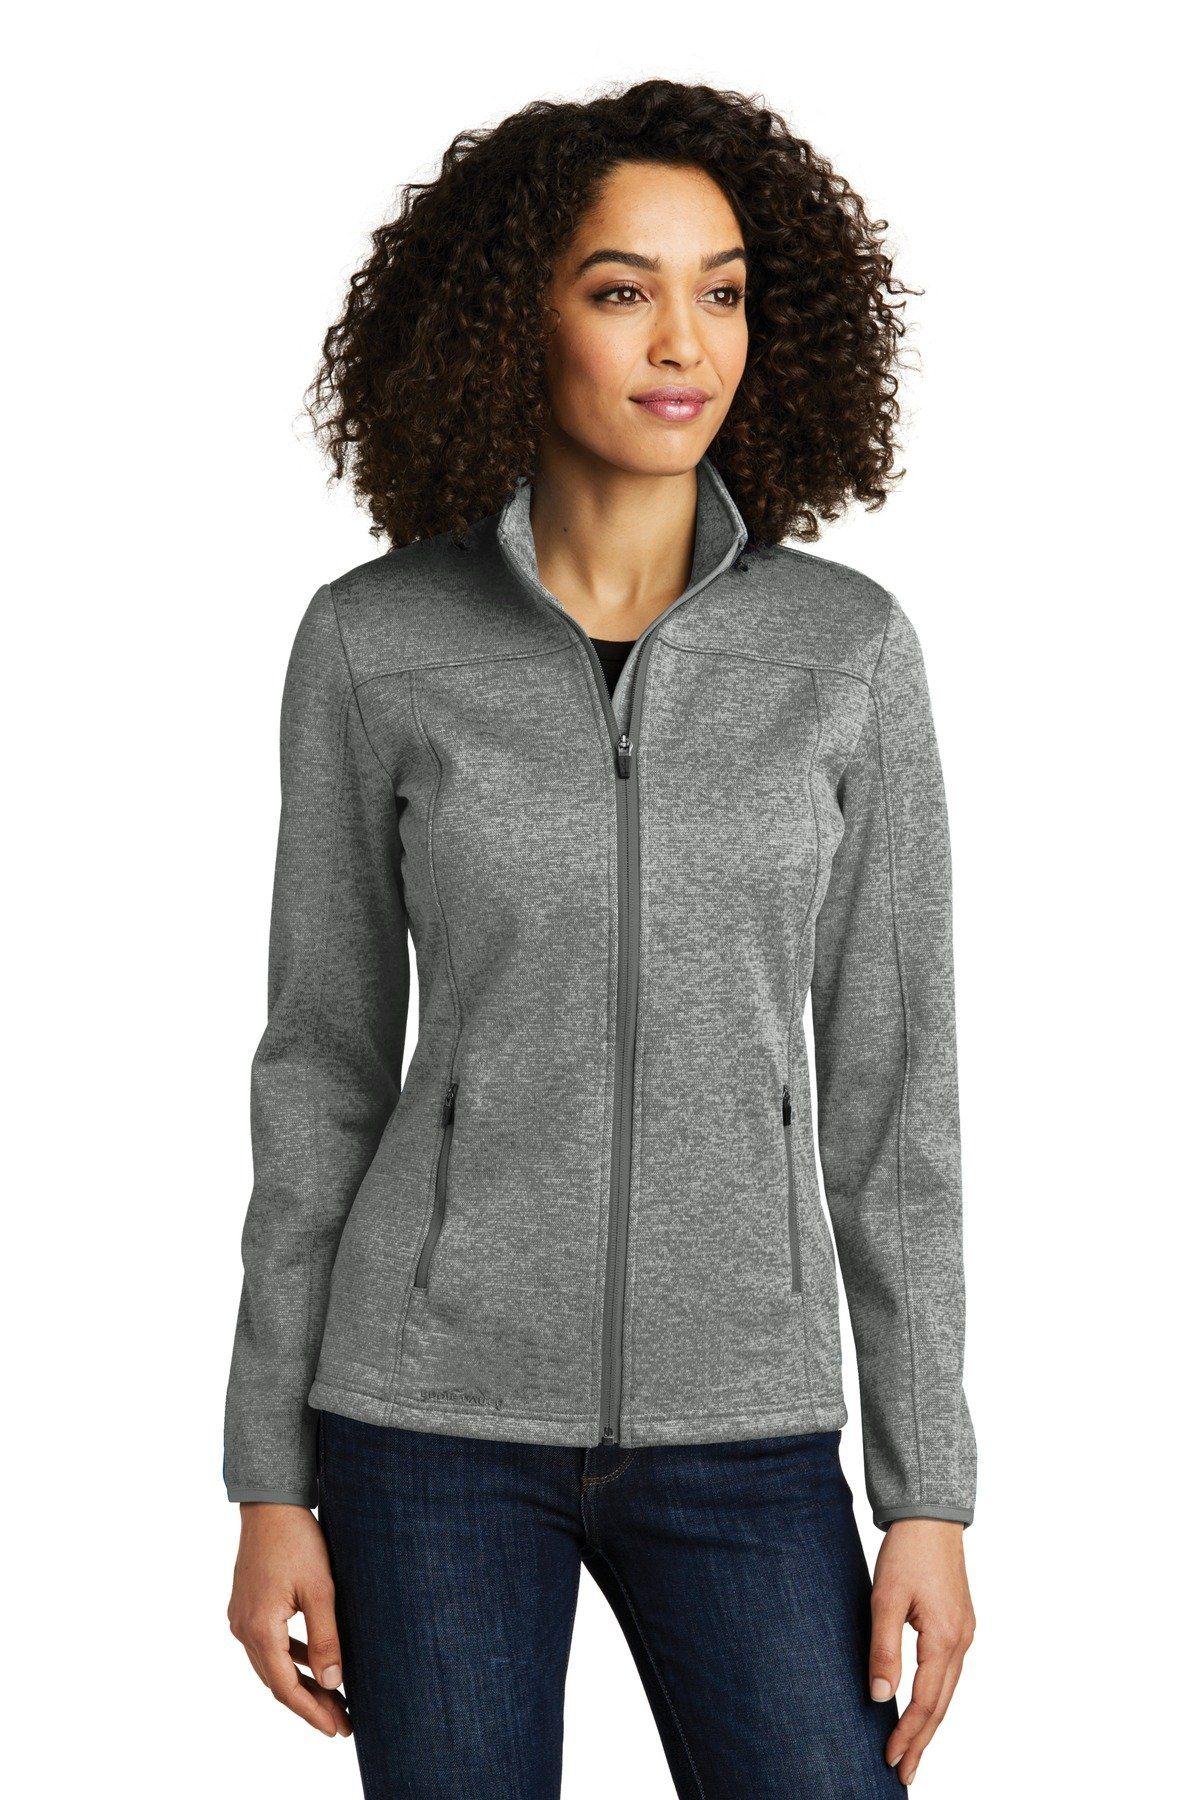 129ec857ae80 Eddie Bauer Ladies StormRepel Soft Shell Jacket EB541 Grey Heather/ Grey